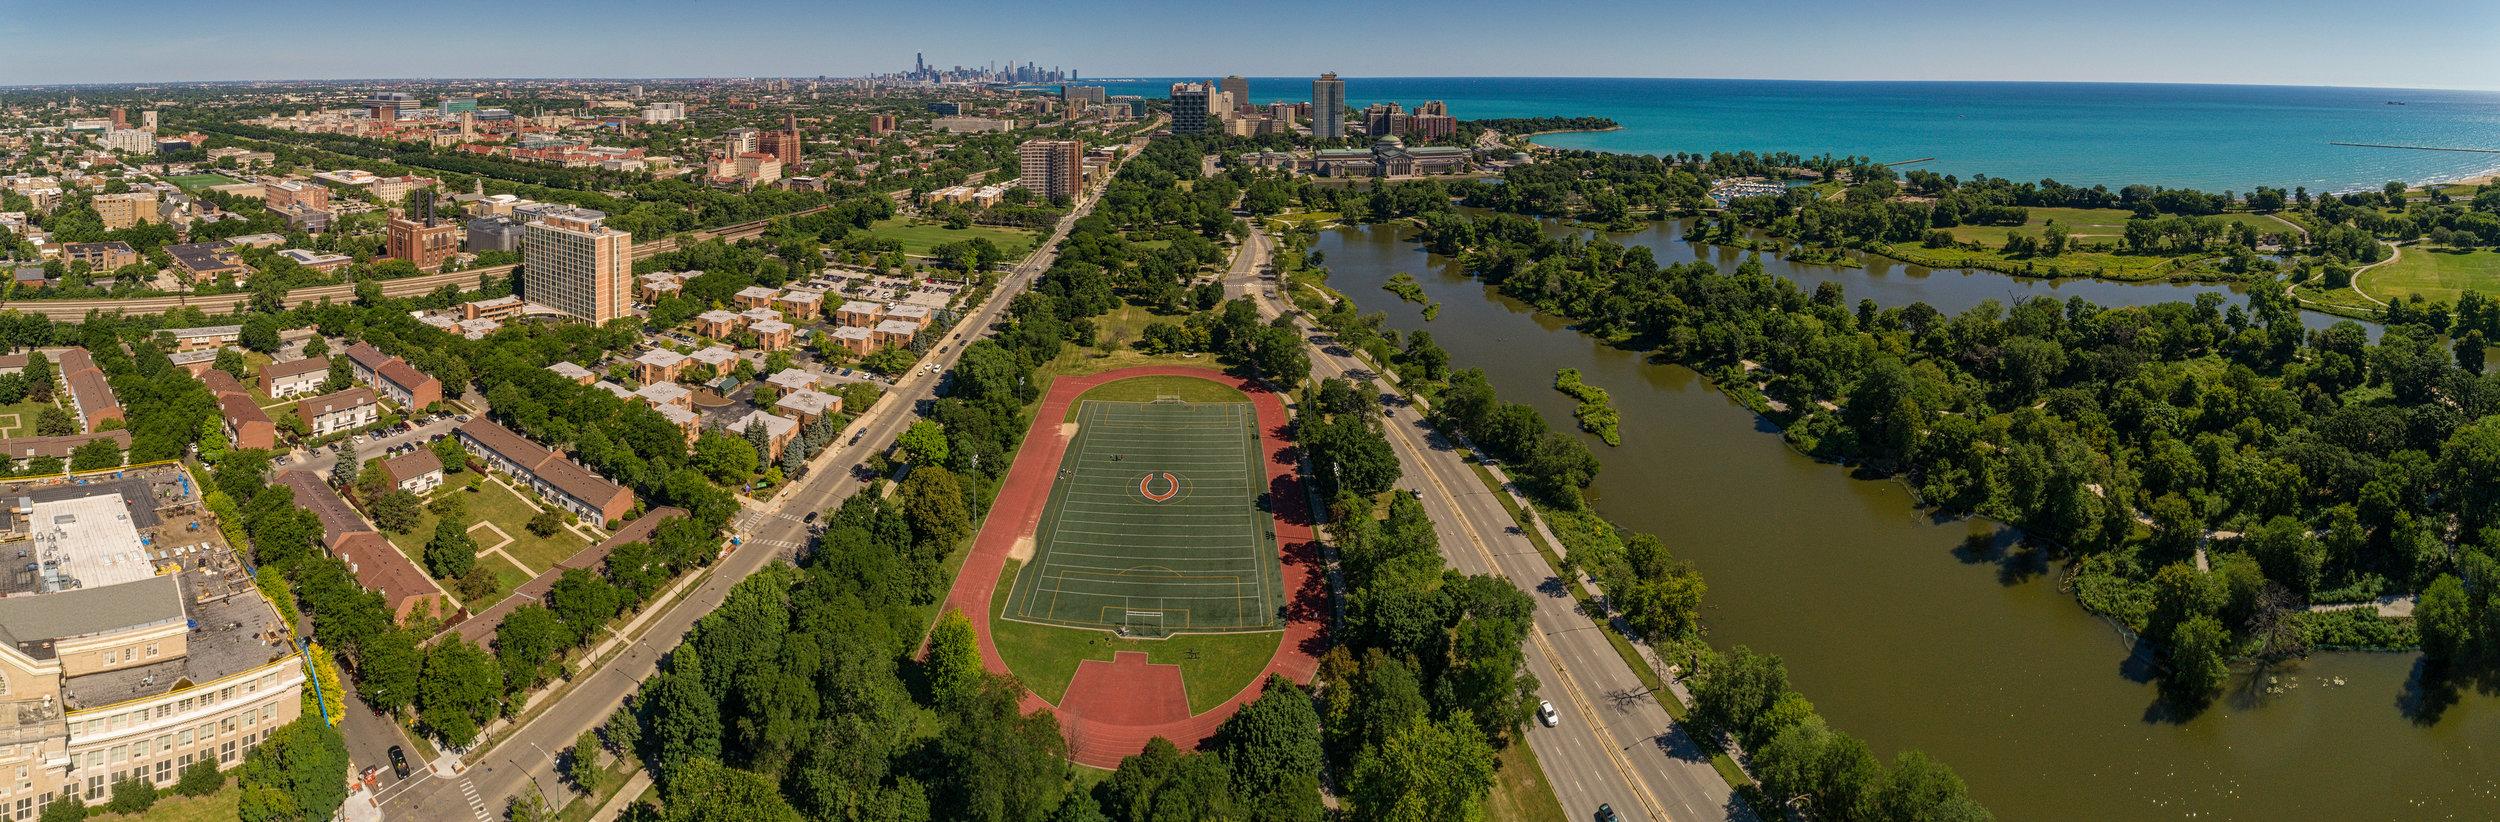 Jackson Park, Chicago